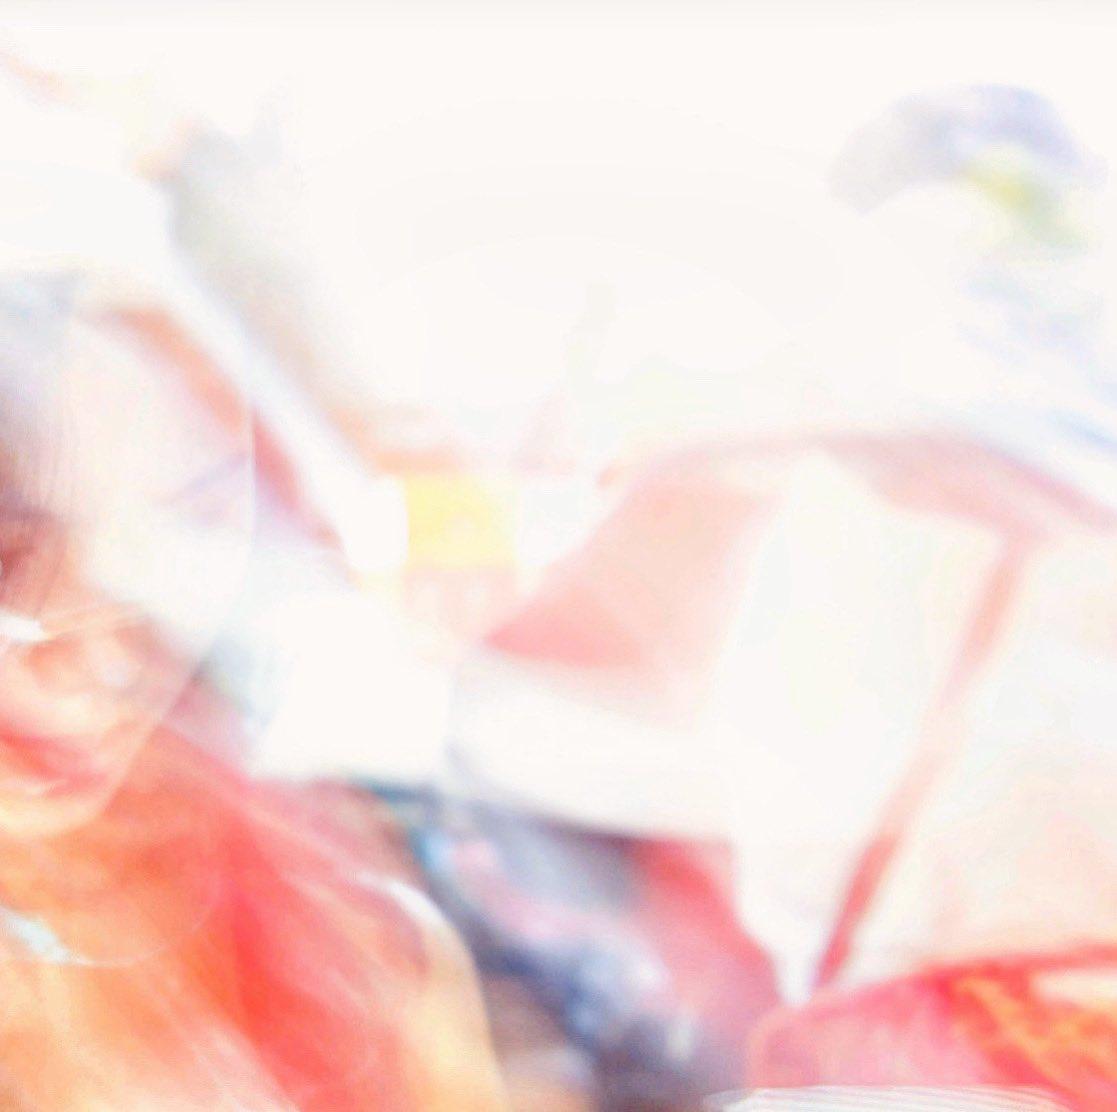 sourire doucement.  #foto #fotografia #arte #photography #photo #picture #photographe #camera #shot #artday #igrecommend #moments #lensculture #artofvisuals #nikon #camera #artwork #artofinstagram #arts #design #designinspiration #designboom #designlovers #光 #アートワークpic.twitter.com/3Wo4Kn5ceO